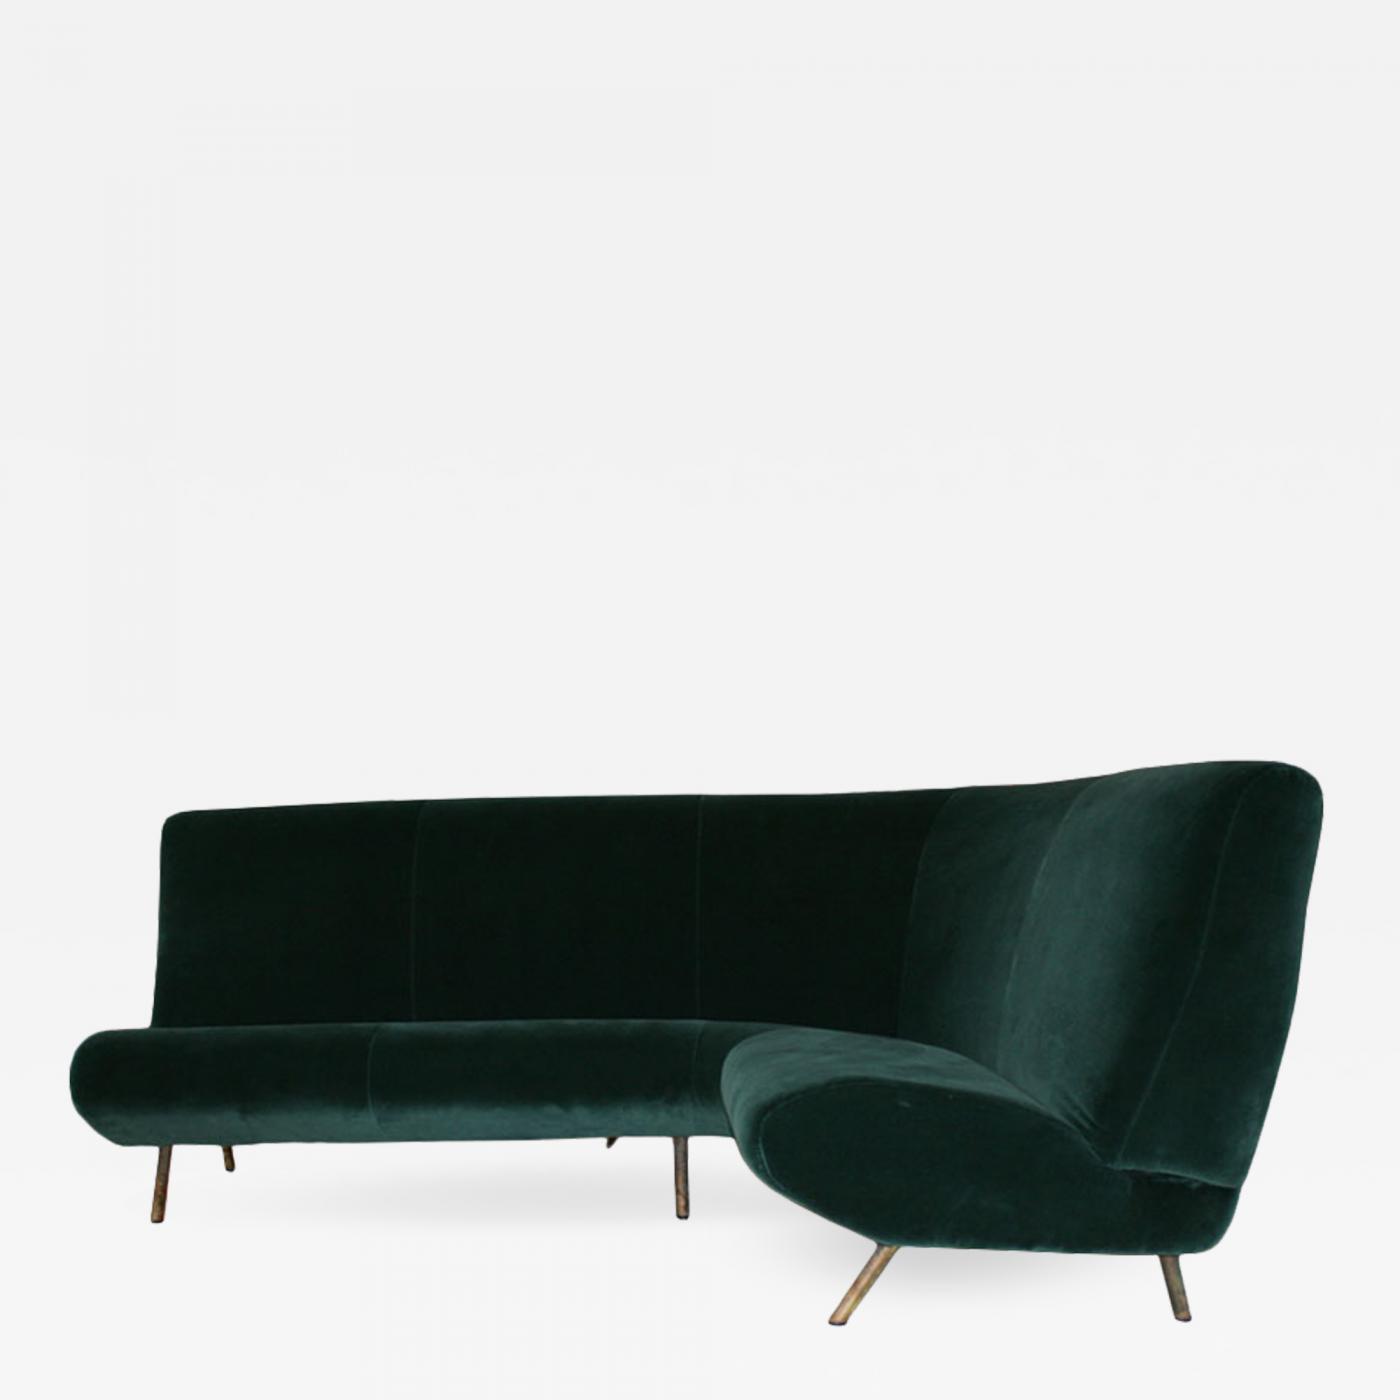 Marco Zanuso - Marco Zanuso Mid-Century Modern Triennale Corner Green  Velvet Italian Sofa